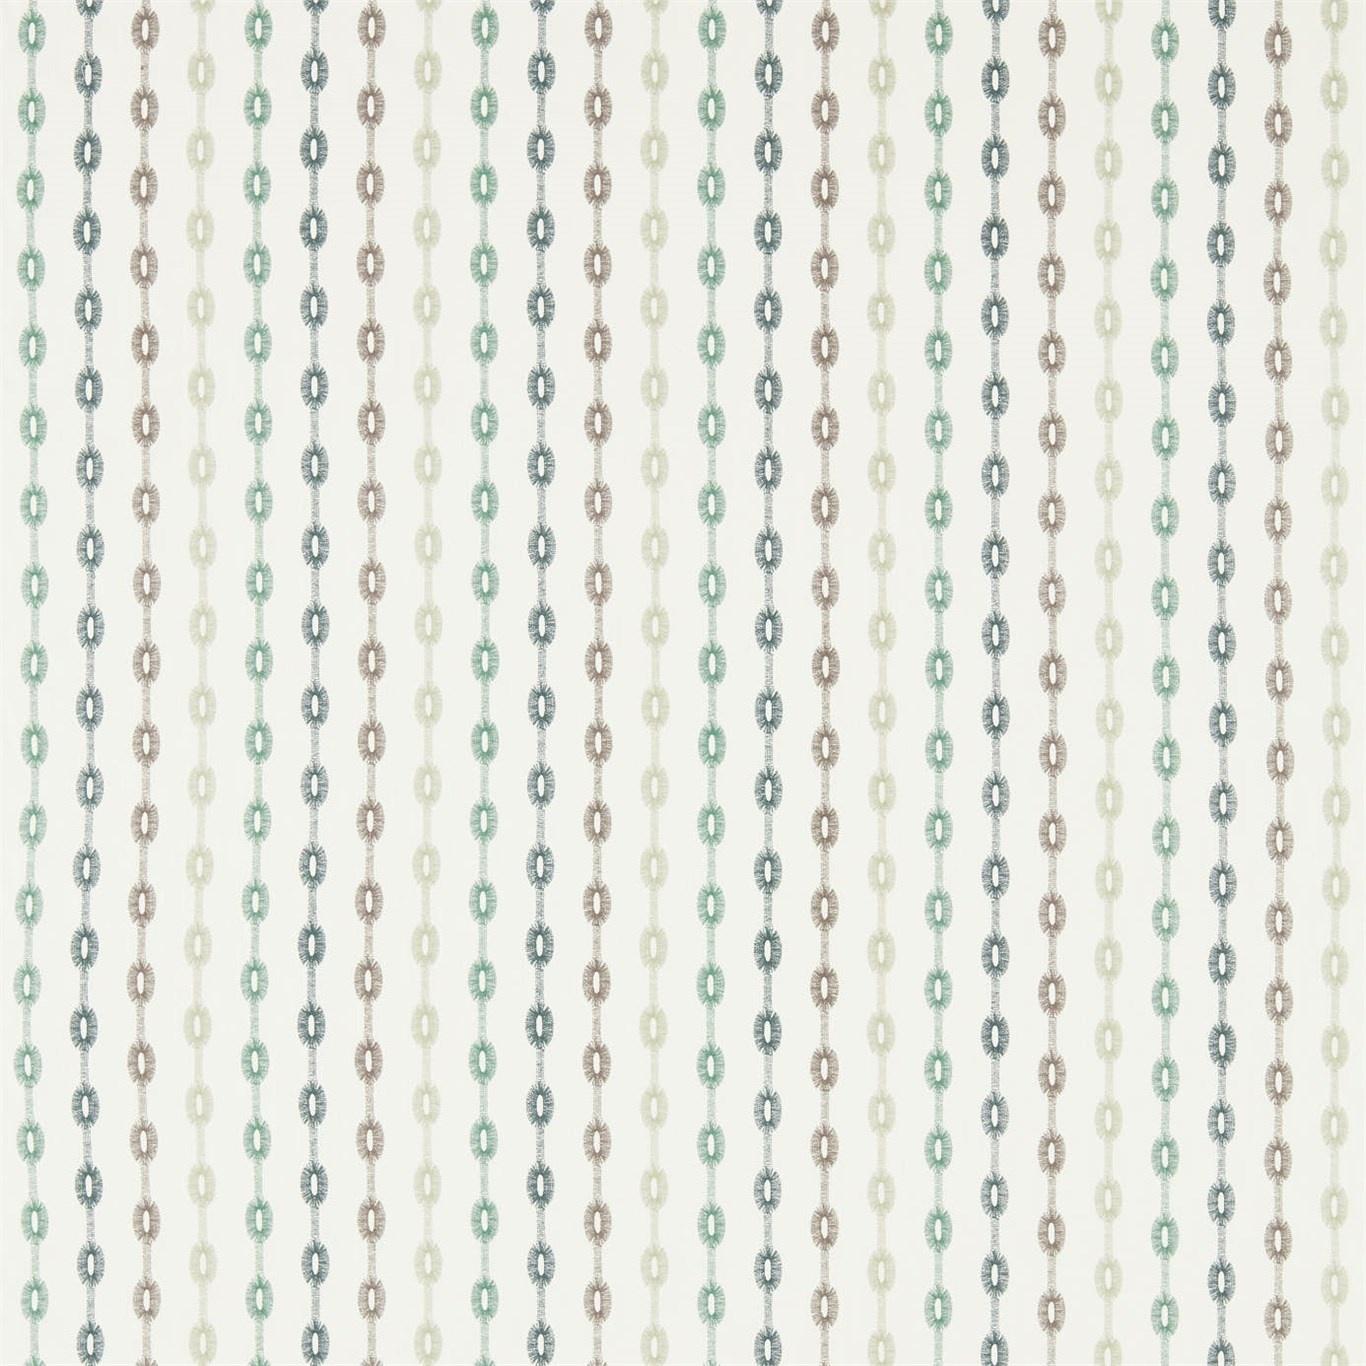 Image of Sanderson Home Shaker Stripe Winter Rocket Curtain Fabric 235893